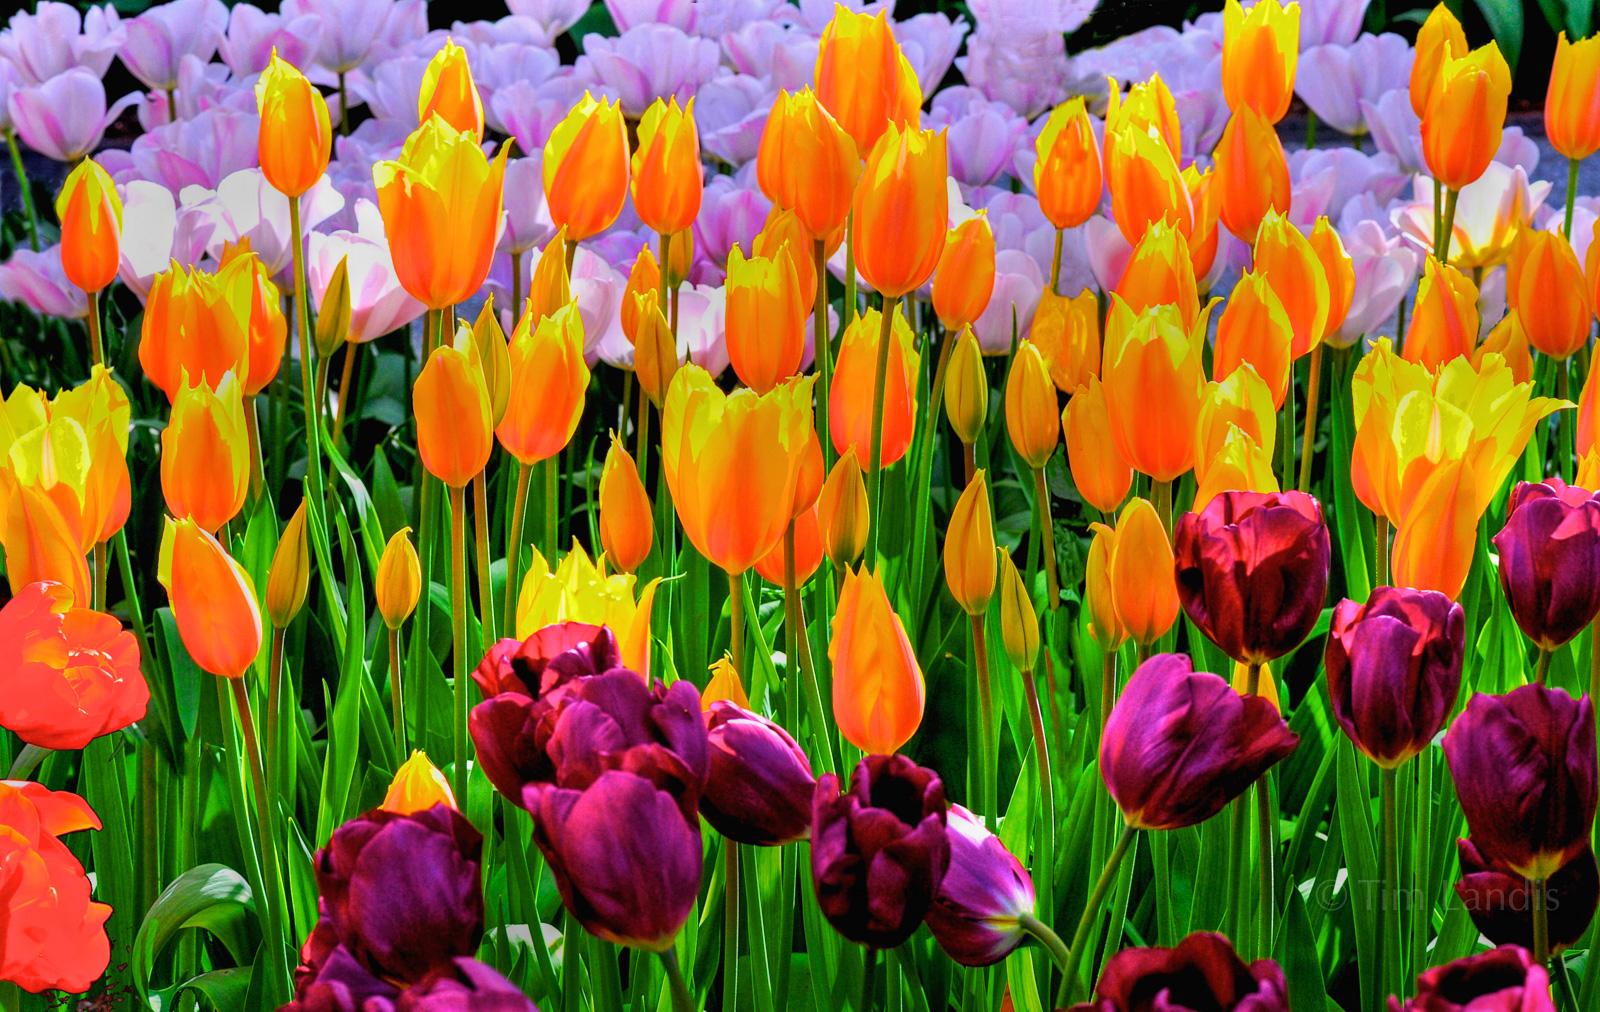 Holland, golden, kukenhof Gardens, lavender, tulip garden, tulips, yellow, photo